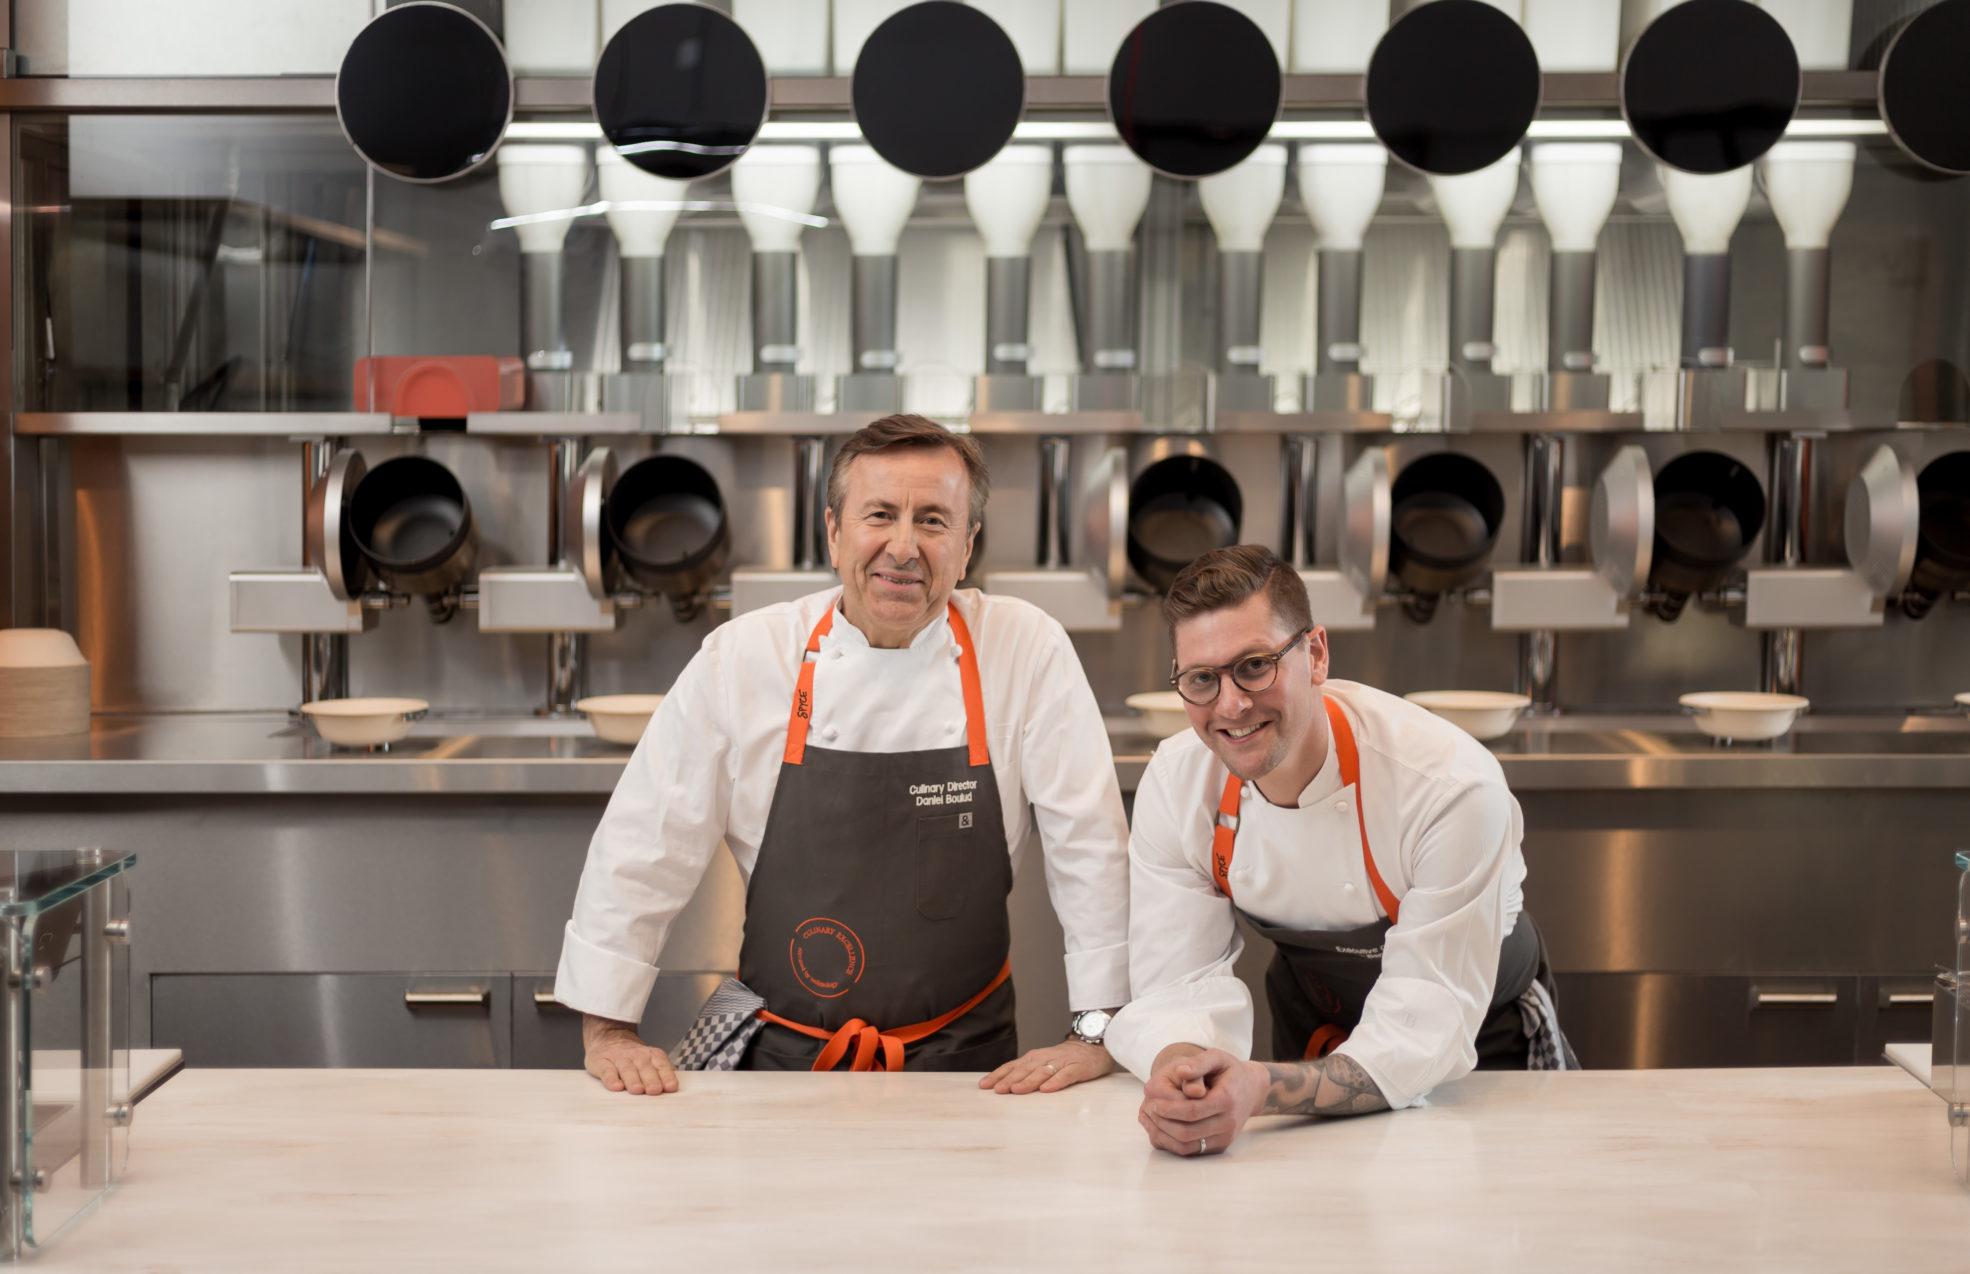 Cheffs-Daniel-Boulud-and-Sam-Benson